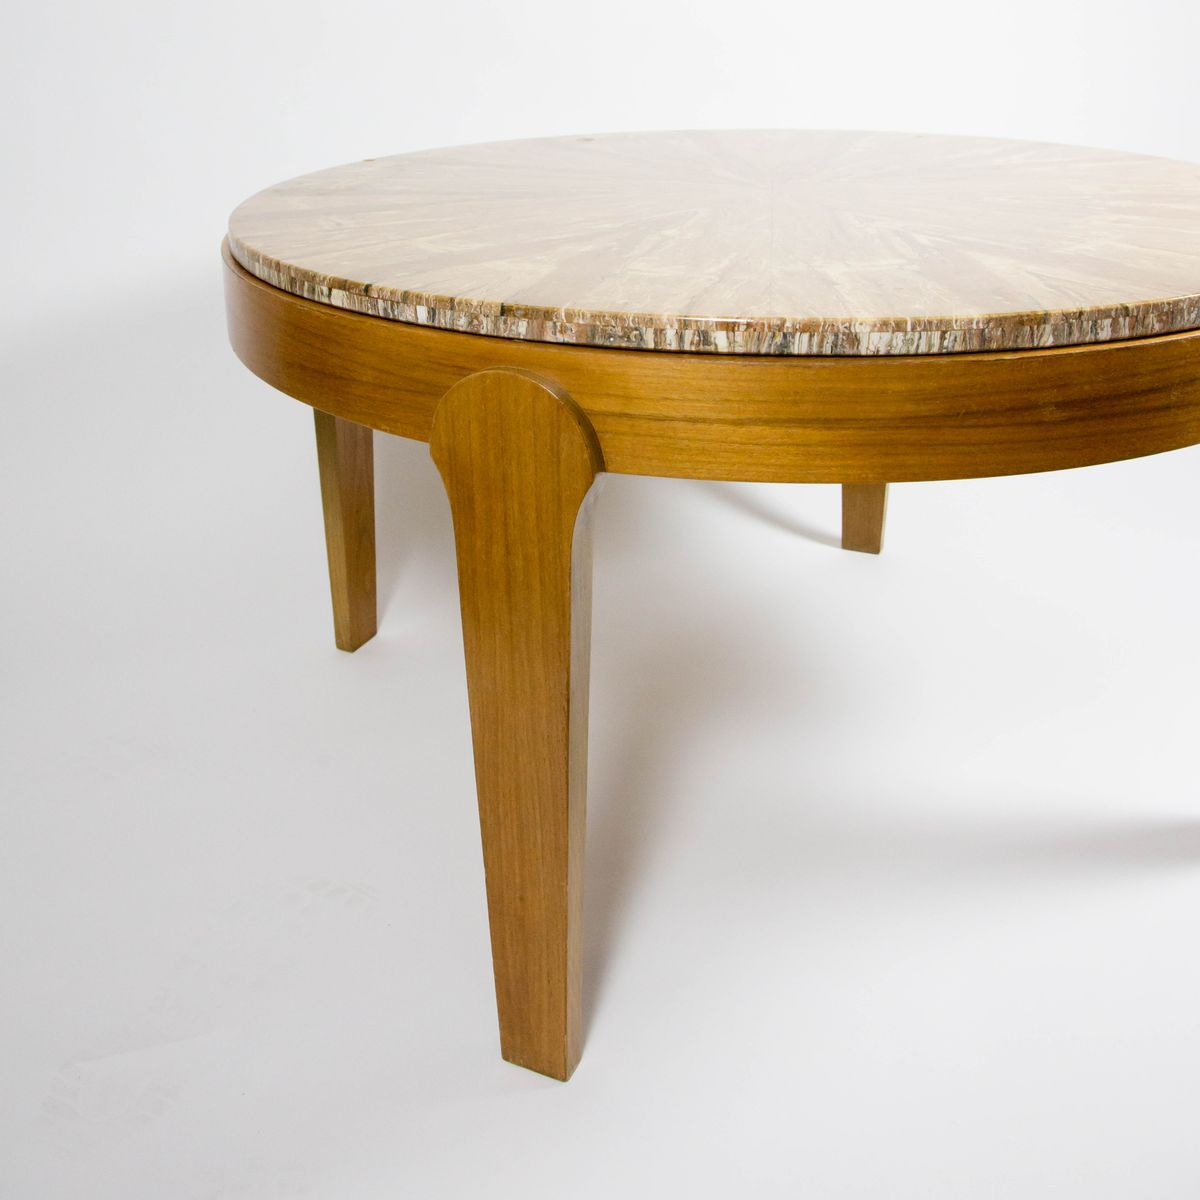 table basse ronde avec dessus en pierre 1970s en vente. Black Bedroom Furniture Sets. Home Design Ideas